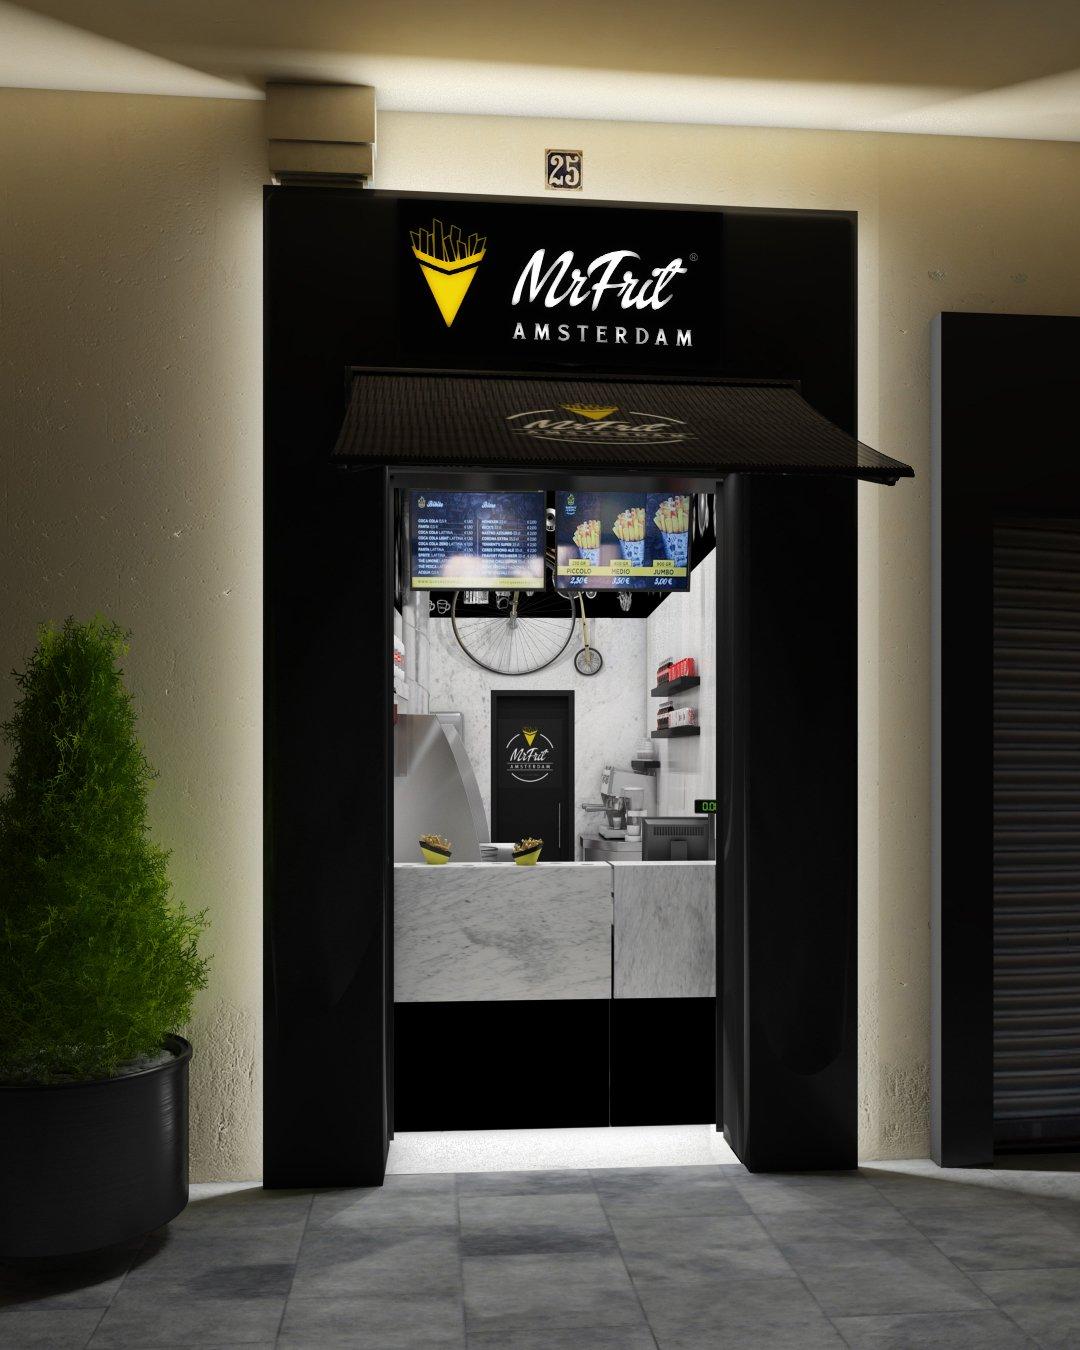 botiga-mr-frit-facana-3-e3b8284d2ac302c8b0e5c3745f248ccb